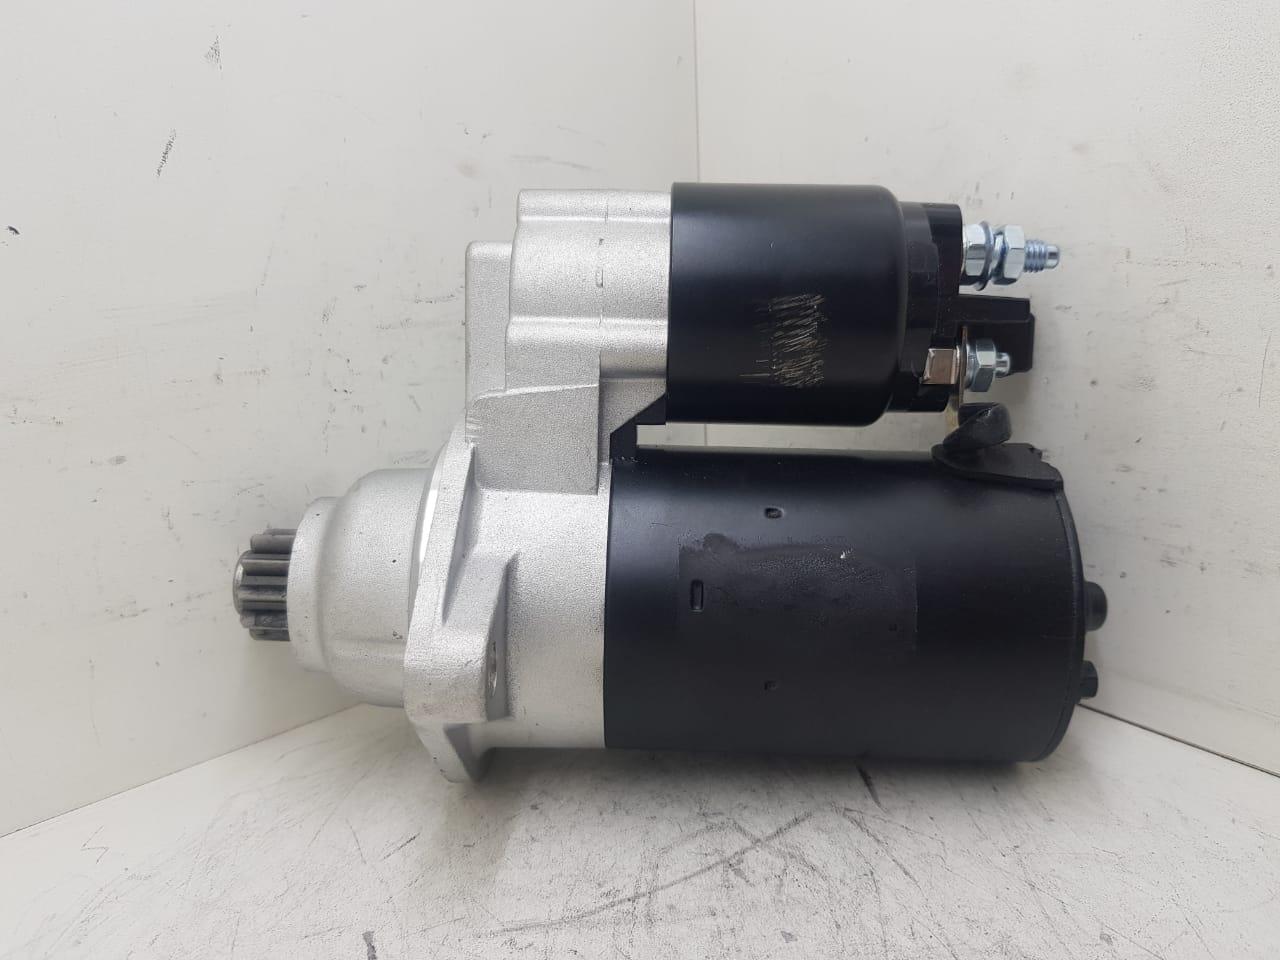 Motor de arranque VW GOL PARATI 1.0 8V 16V 96 ATE 2007 MI BOSCH 12V 10 DENTES F000AL0401 F000AL0414 377911023 B 80 125 01 E 20527 D 20305 AEC11003